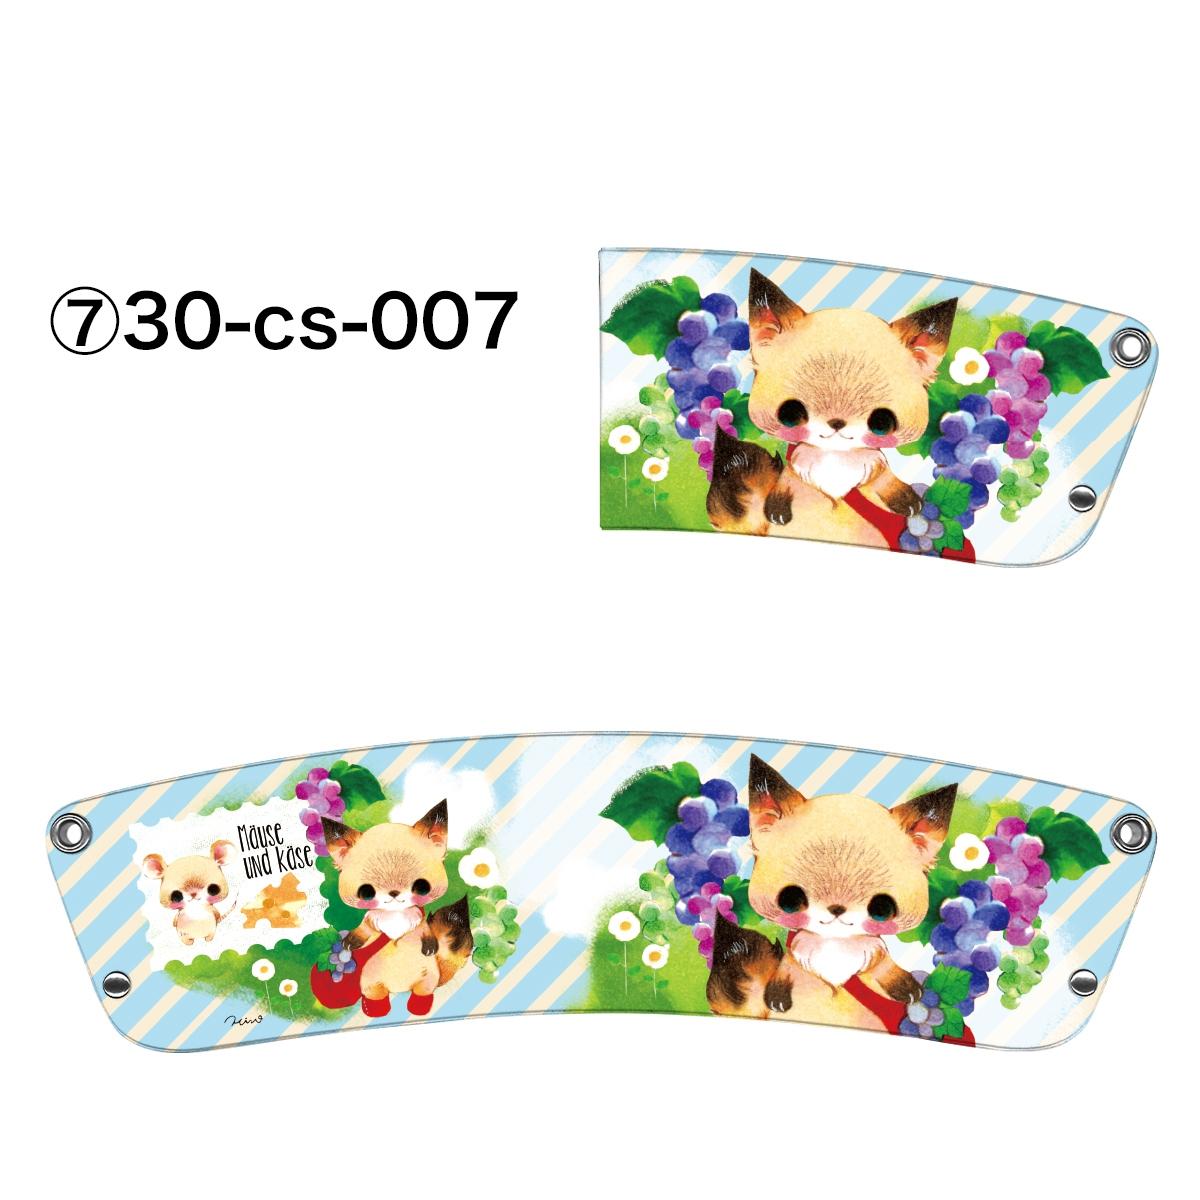 tk-jiang(ティーケージアン)オリジナル カップスリーブ レザーの商品画像14